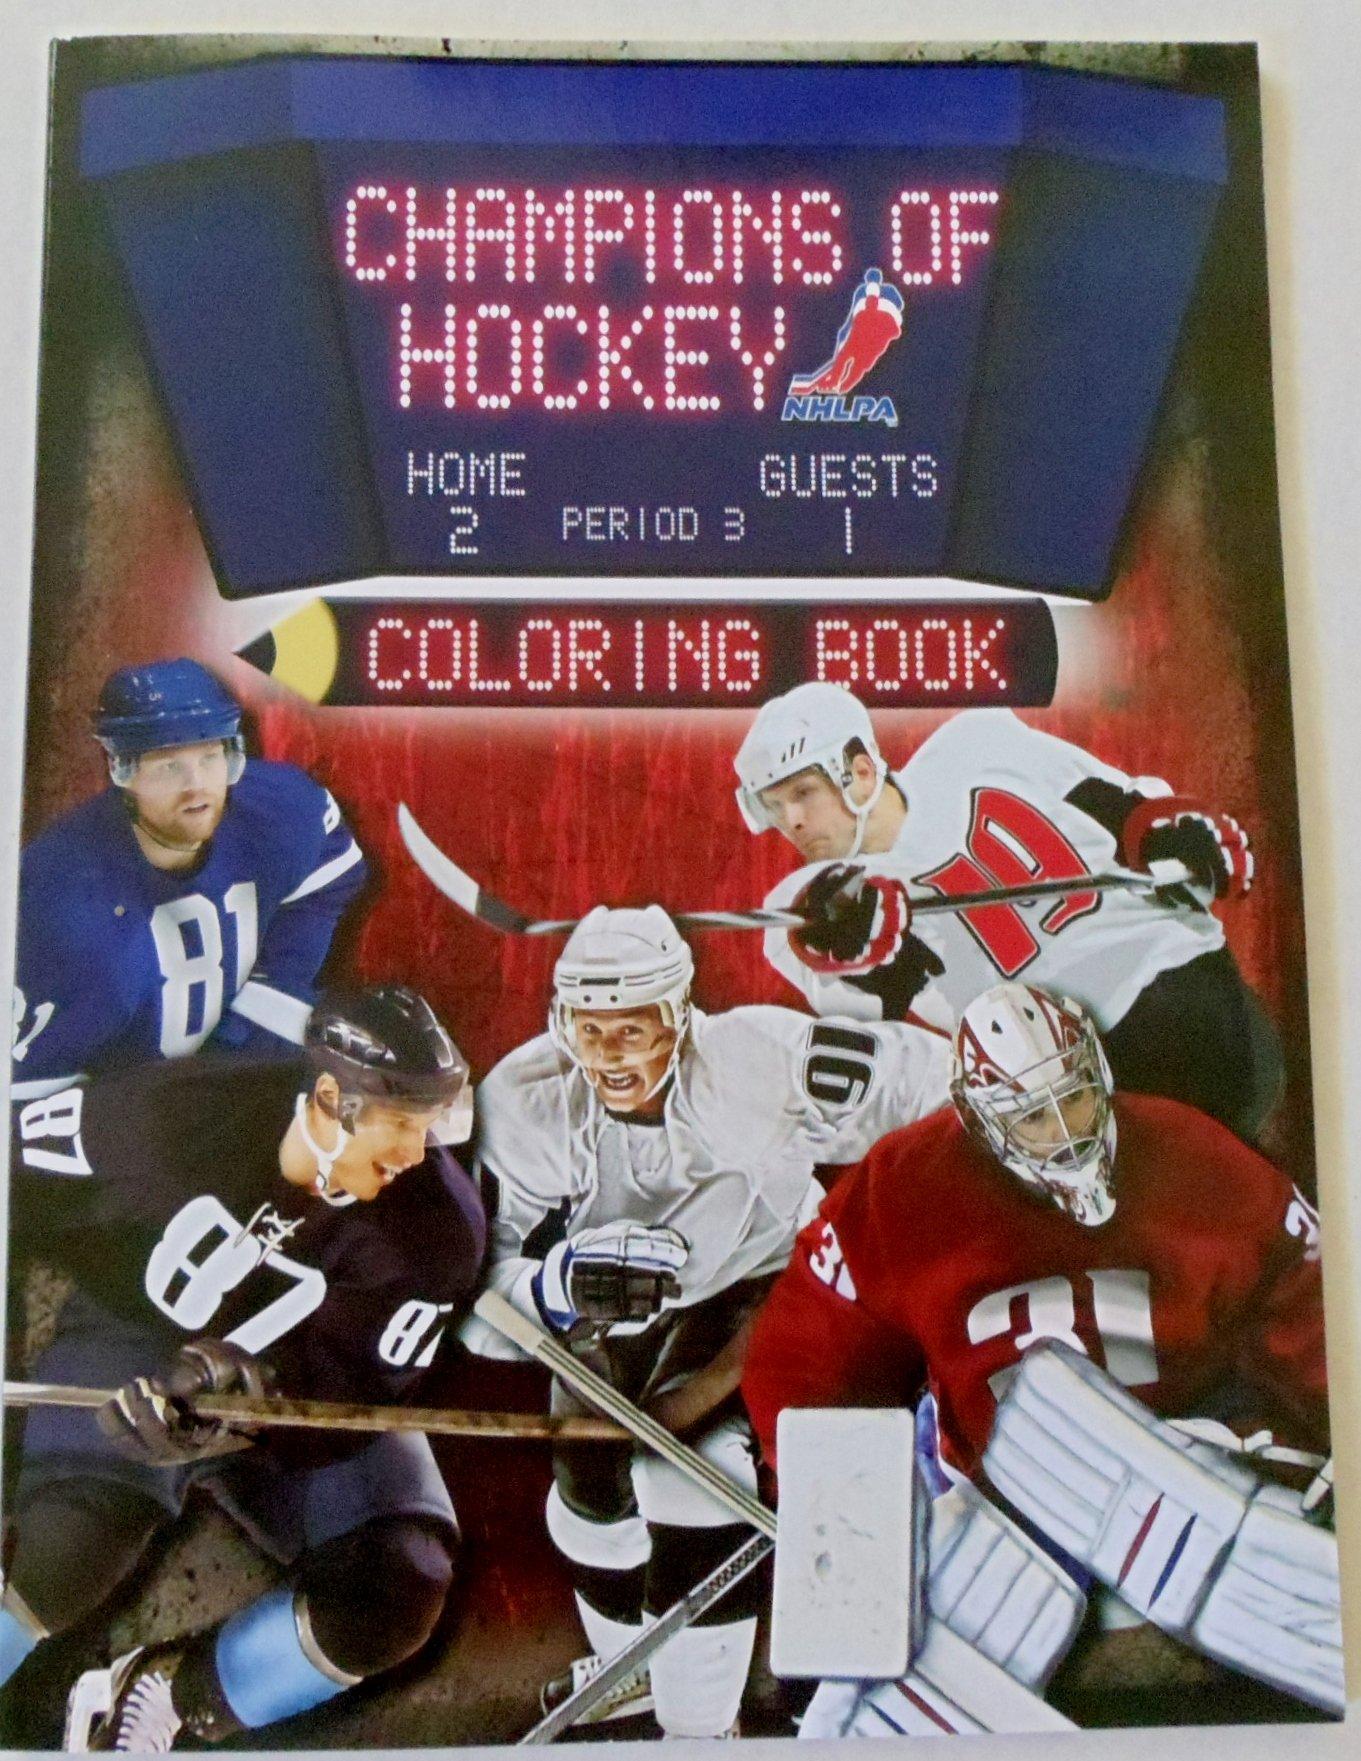 champions of hockey coloring book nhlpa nhlpa 0062255078654 amazoncom books